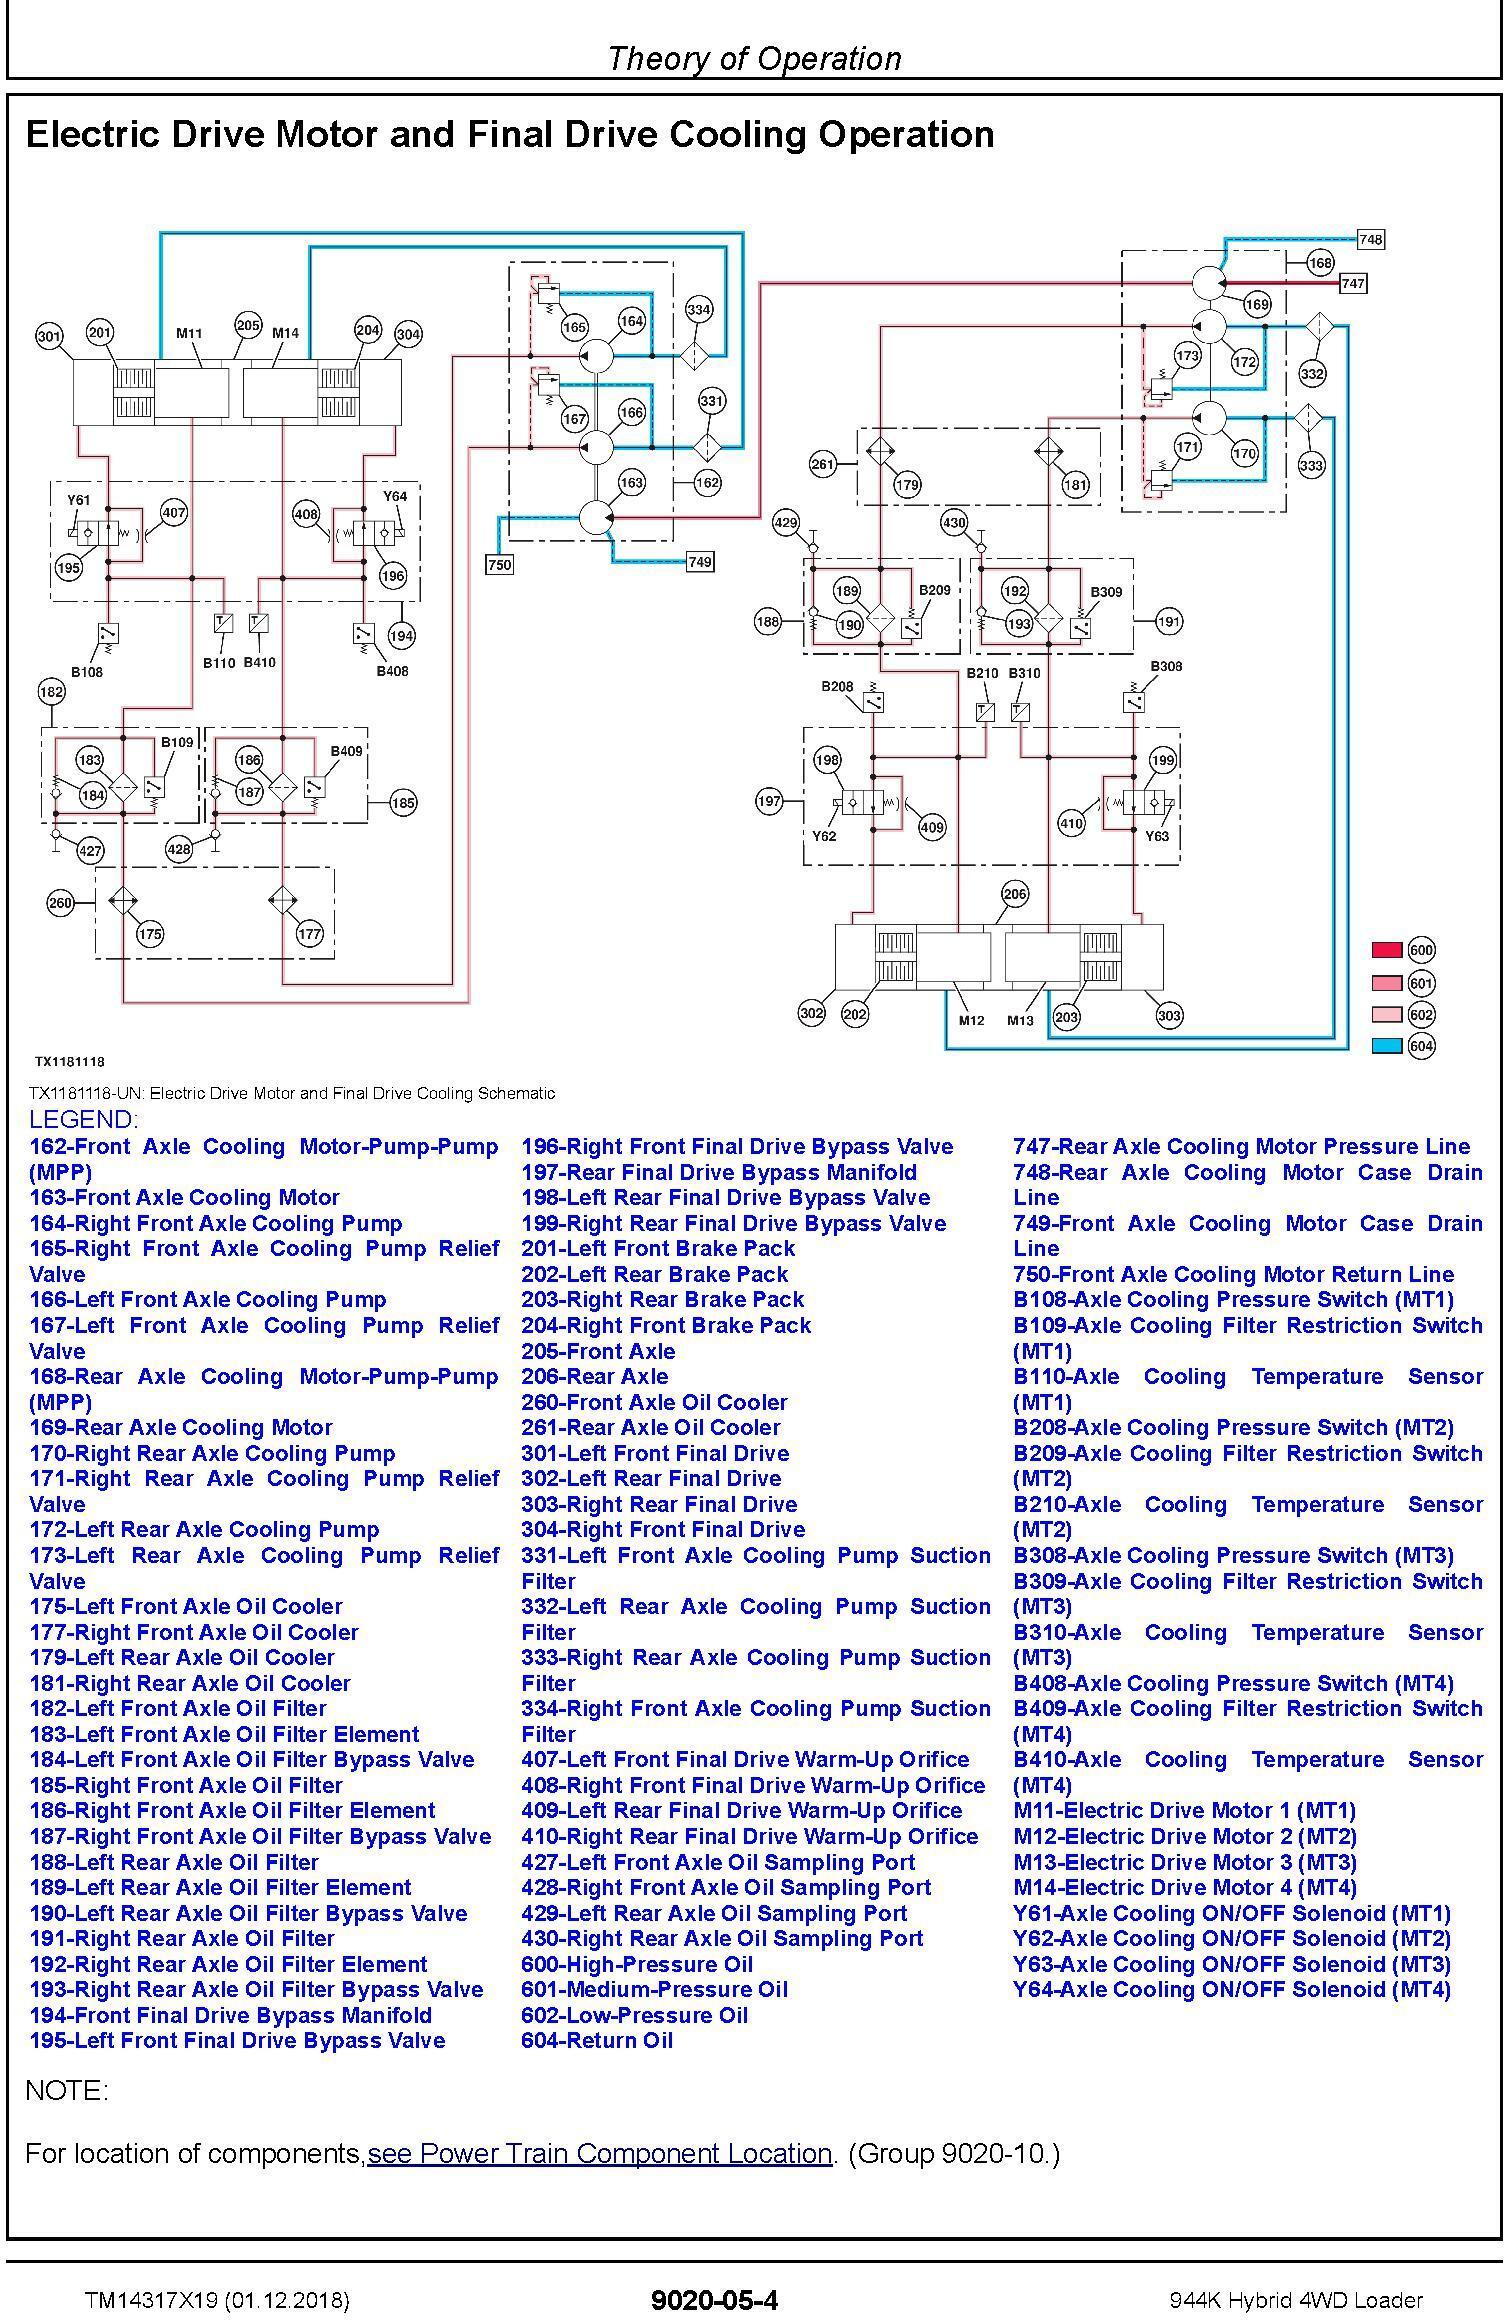 John Deere 944K Hybrid 4WD Loader (SN.F690605-) Operation&Test Technical Service Manual (TM14317X19) - 3